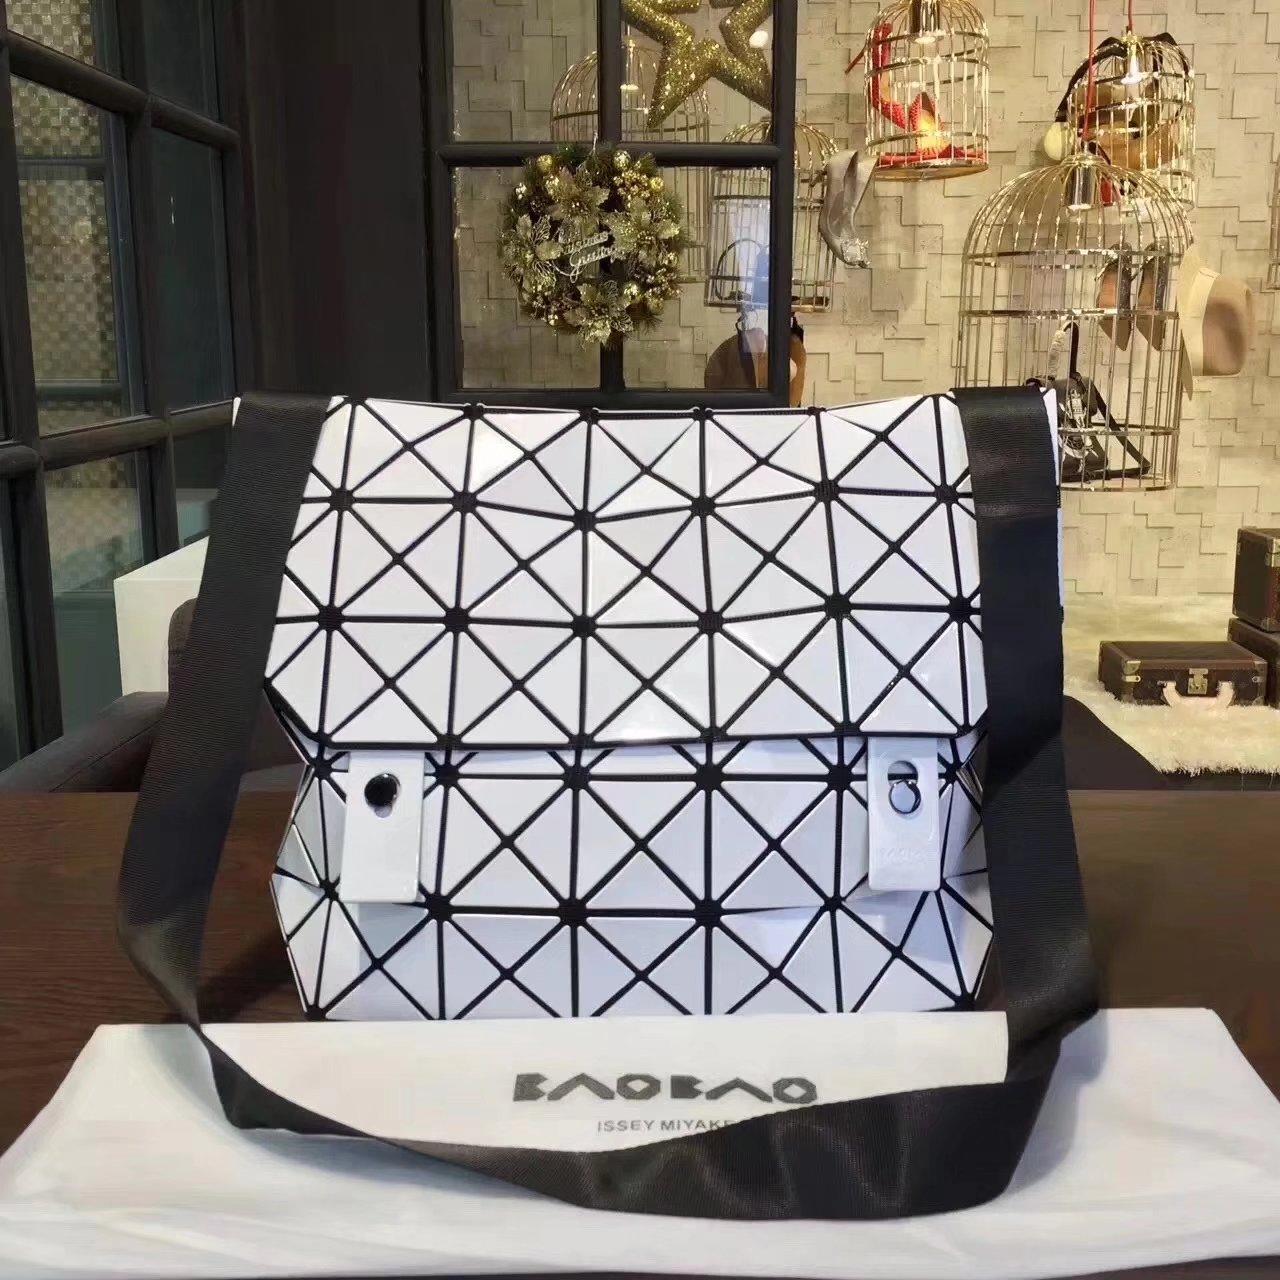 Issey Miyake Bao Bao Shoulder Bag White